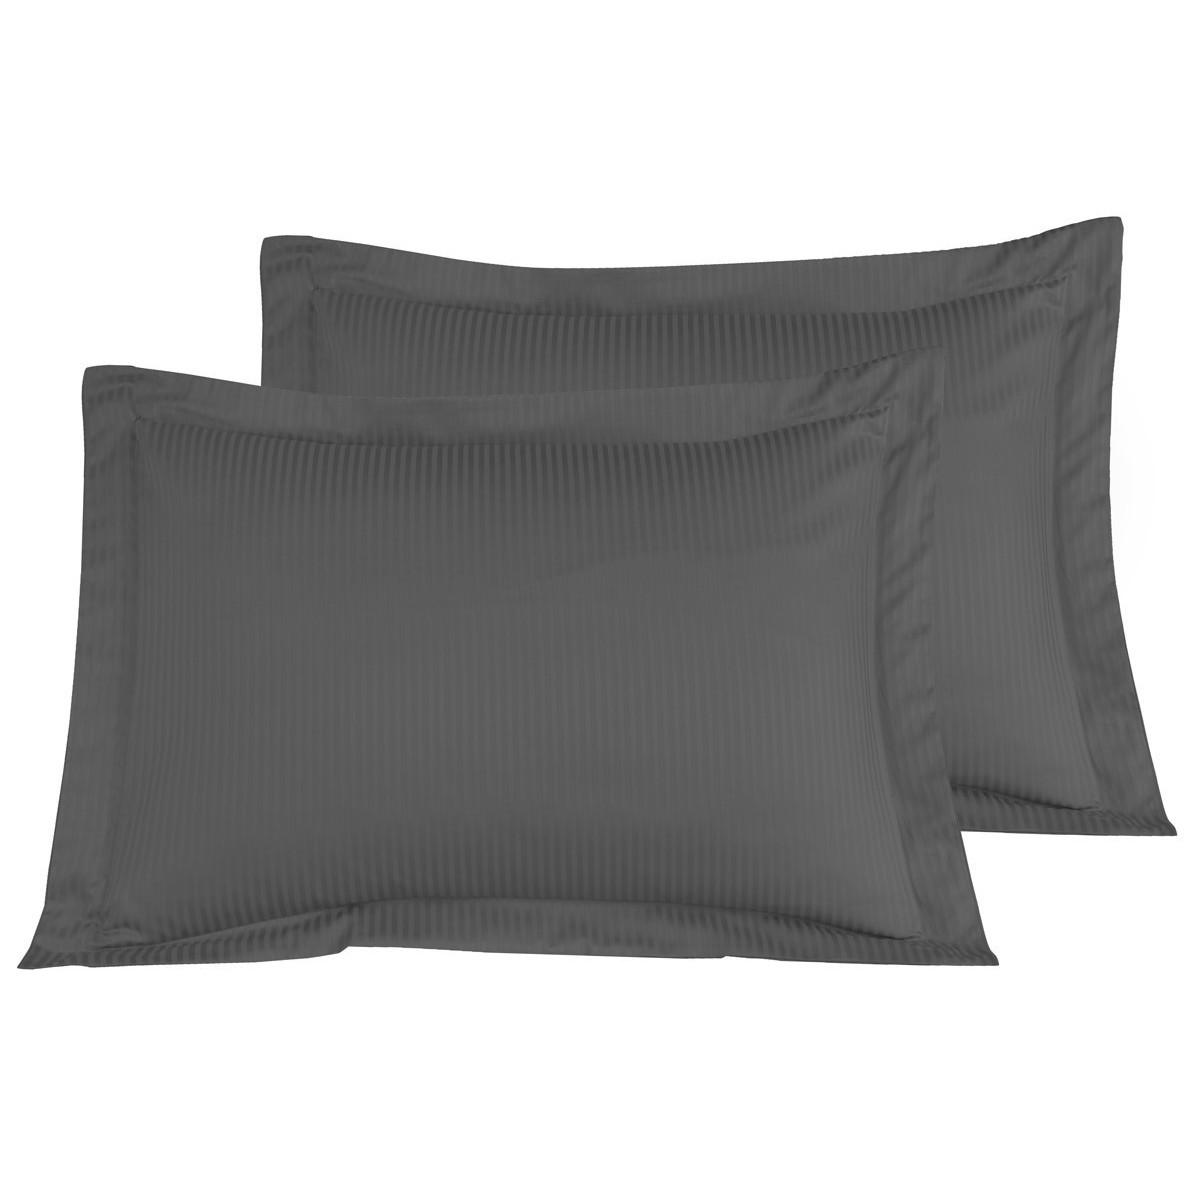 2 taies d'oreiller rayées satin coton Anthracite 50x70 cm